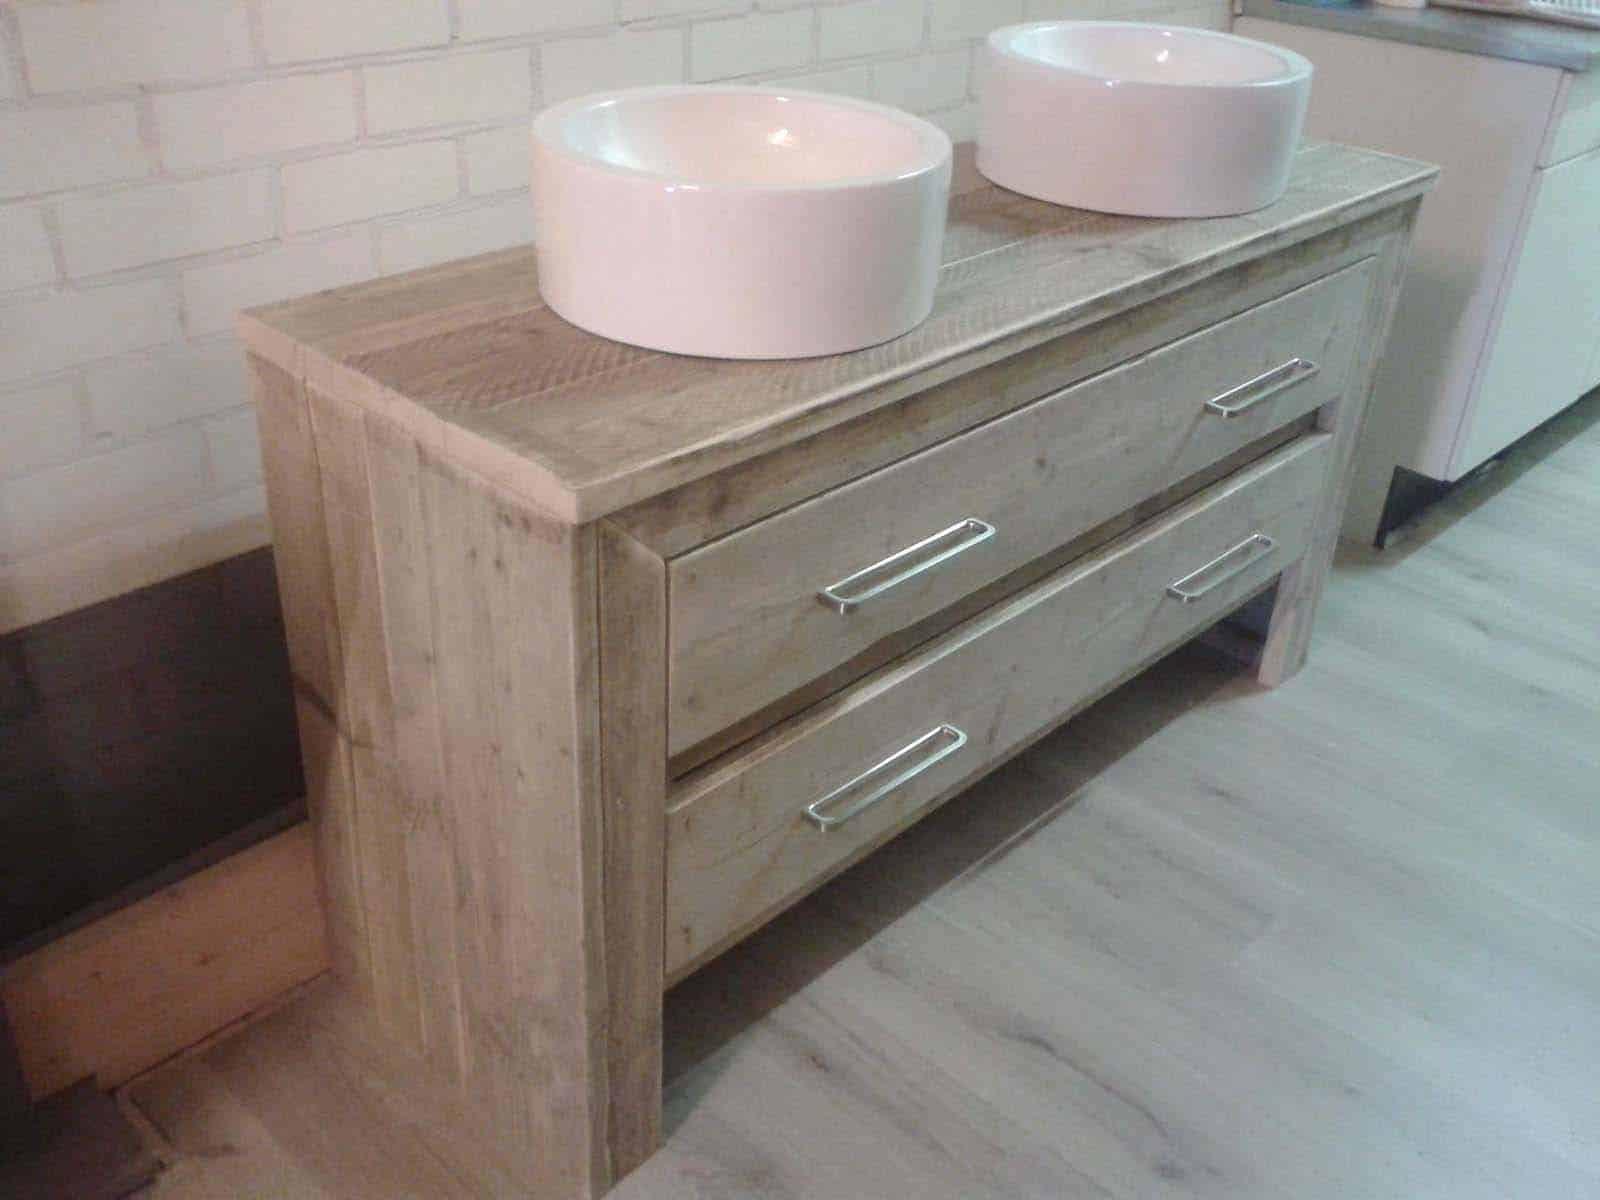 Badkamermeubel steigerhout type 2 meubelen van steigerhout - Weergaven kind kast ...